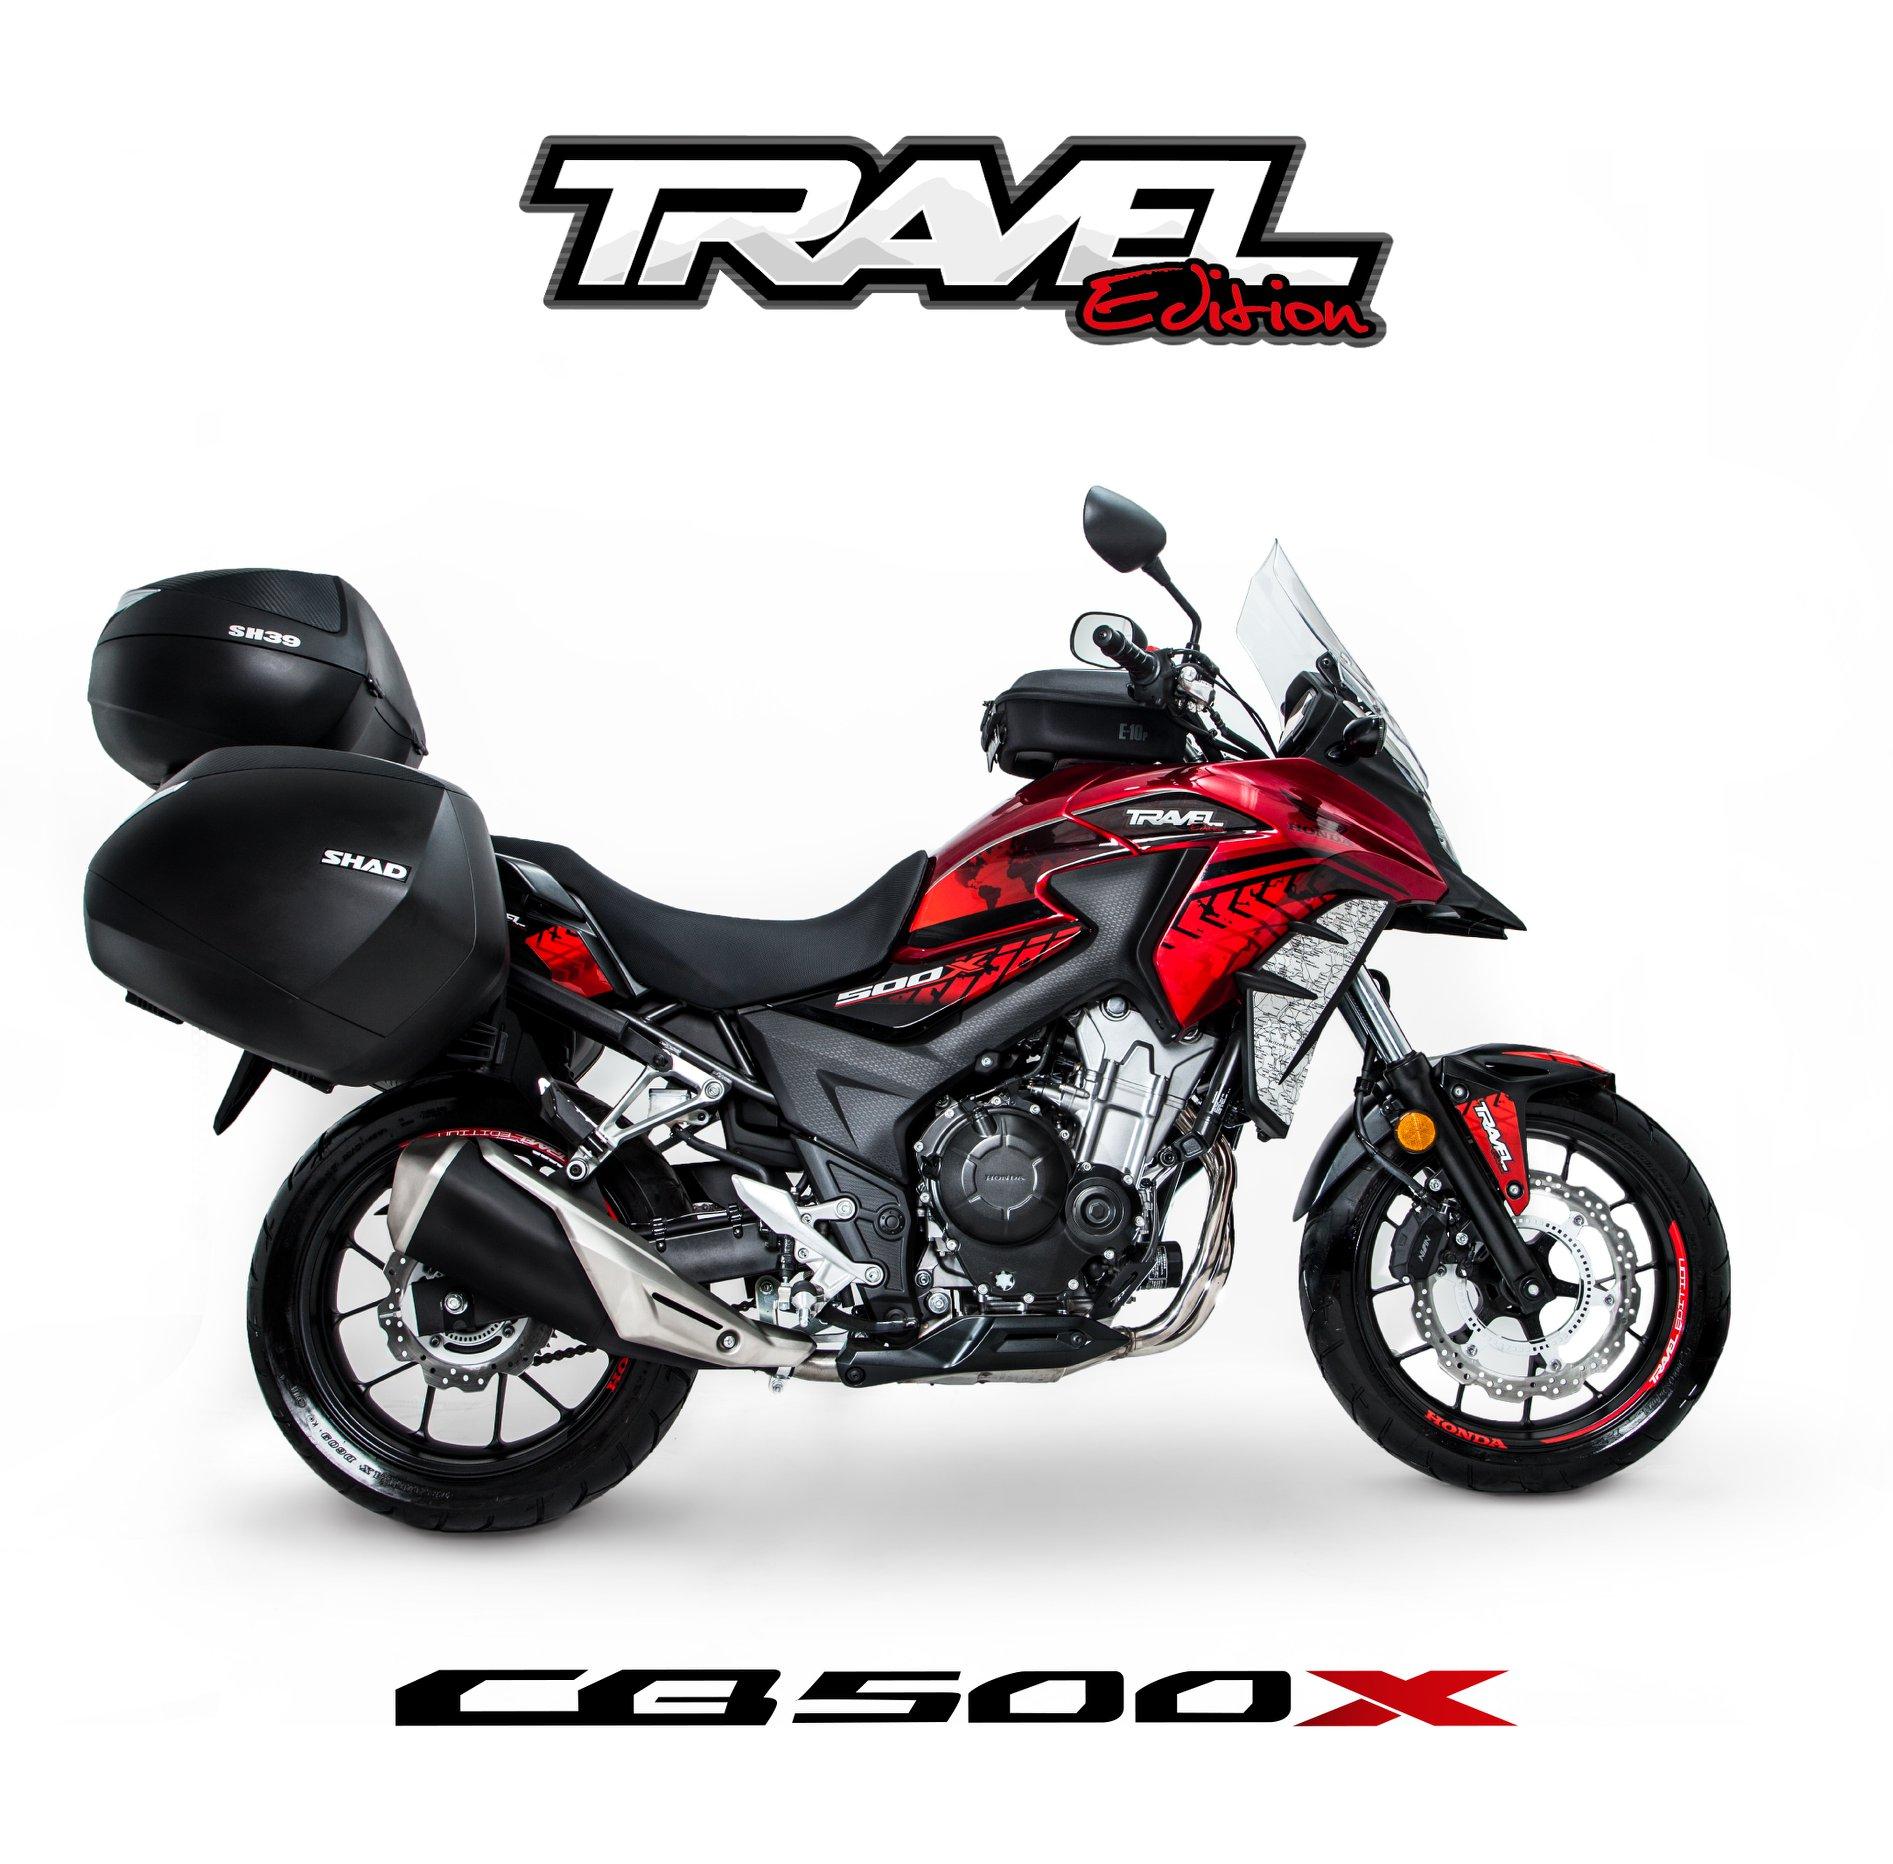 CB500x Travel Edition